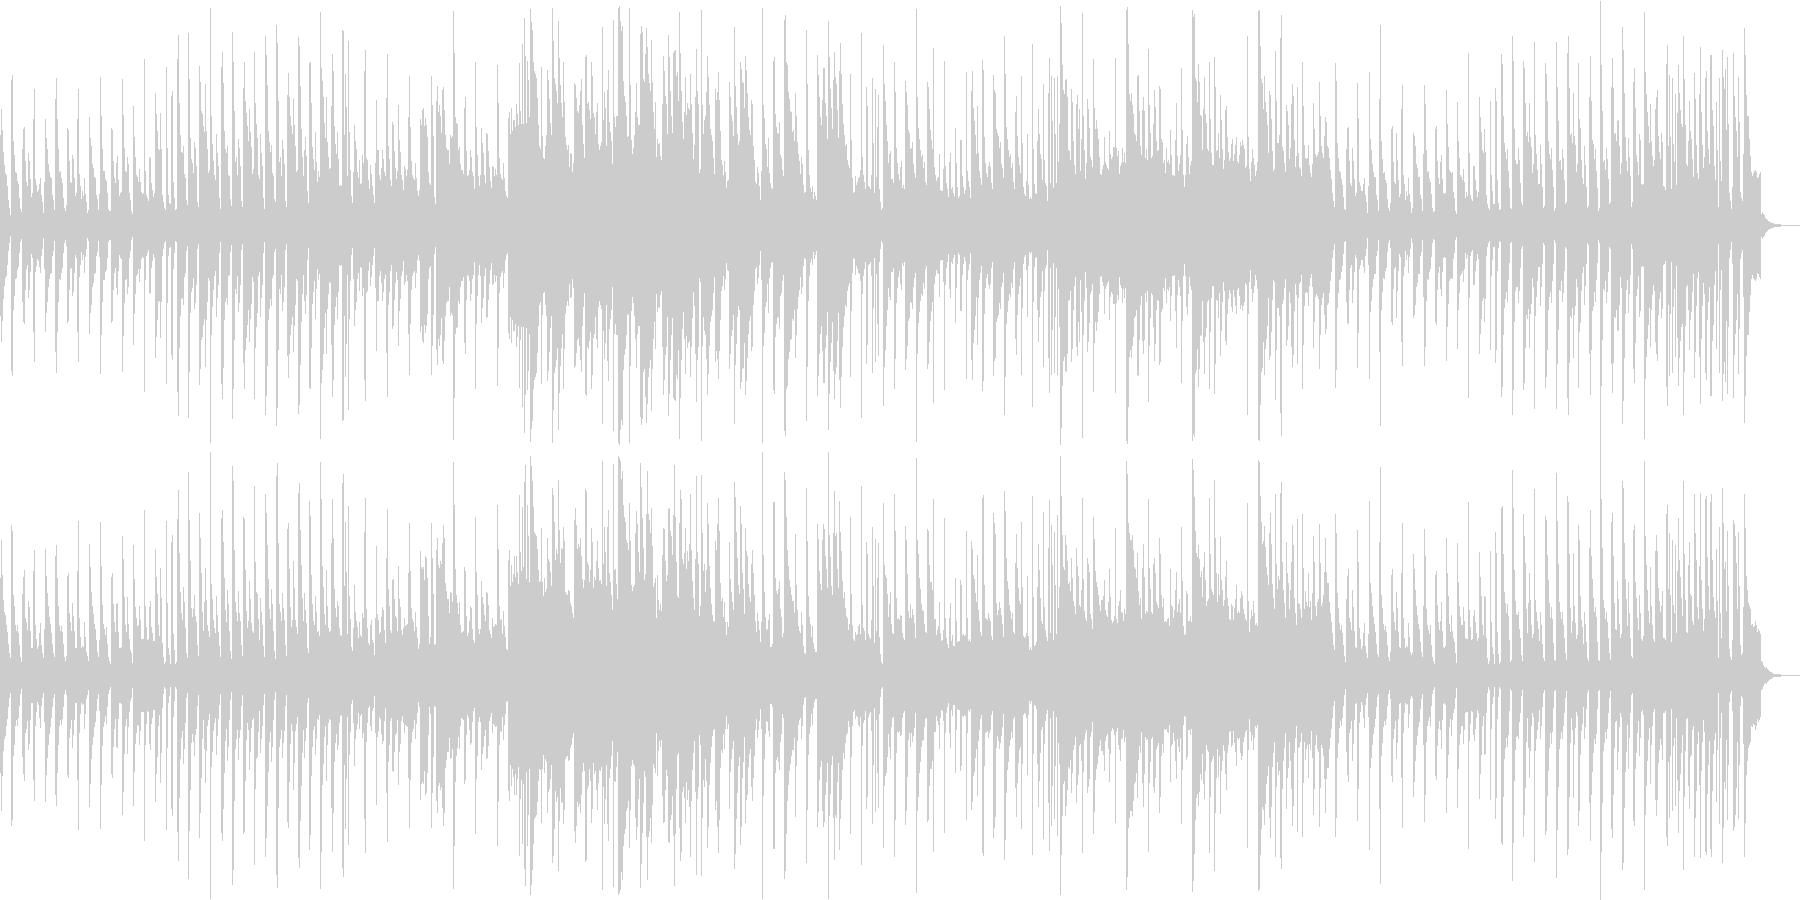 8bitメルヘン、コミカル 1コーラス版の未再生の波形